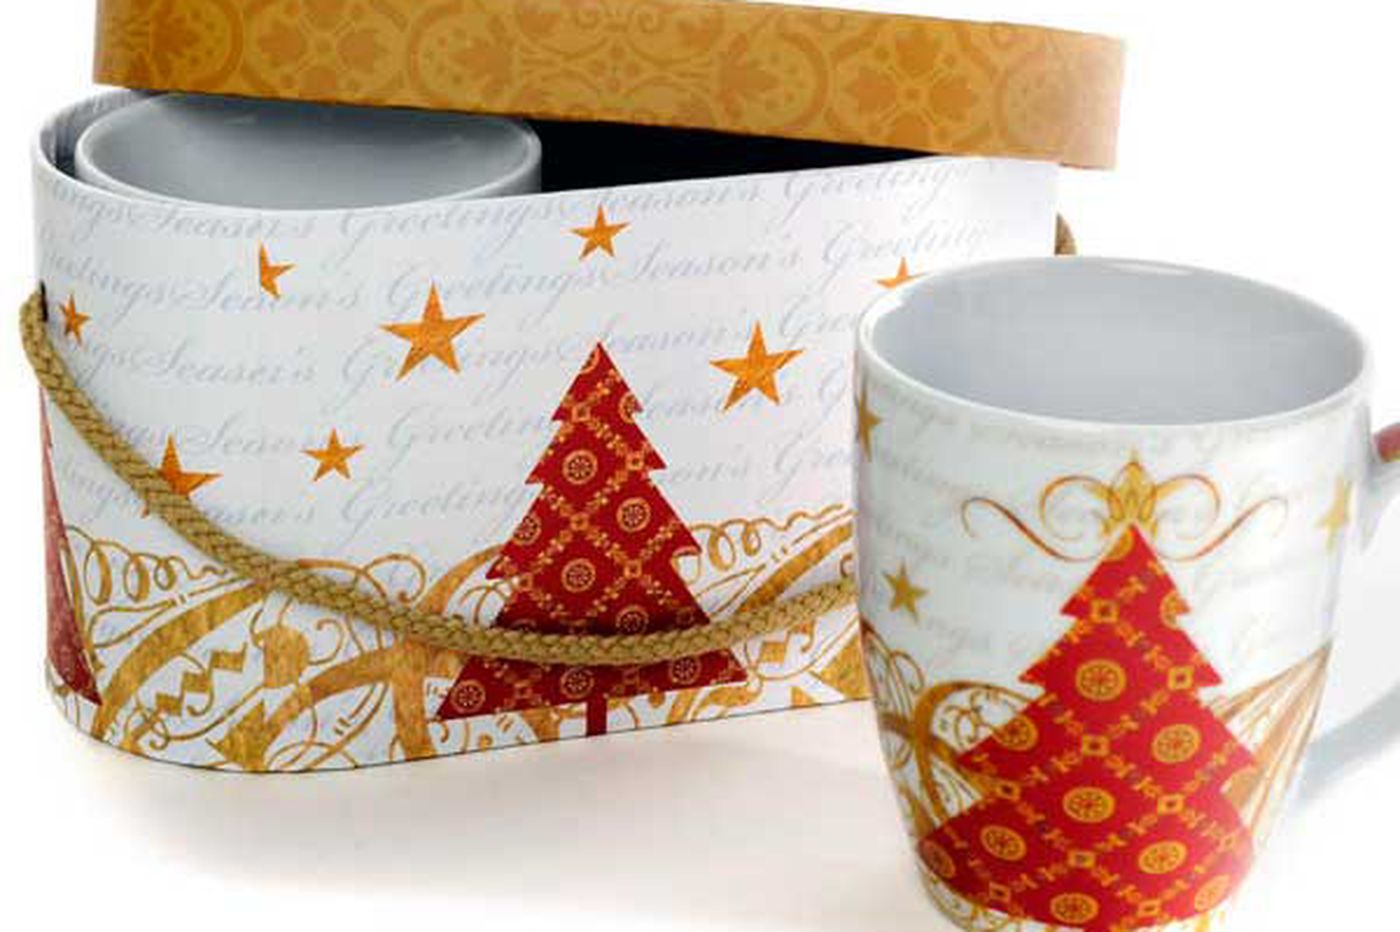 MarketBasket: Habañeros in the hood; a festive mug